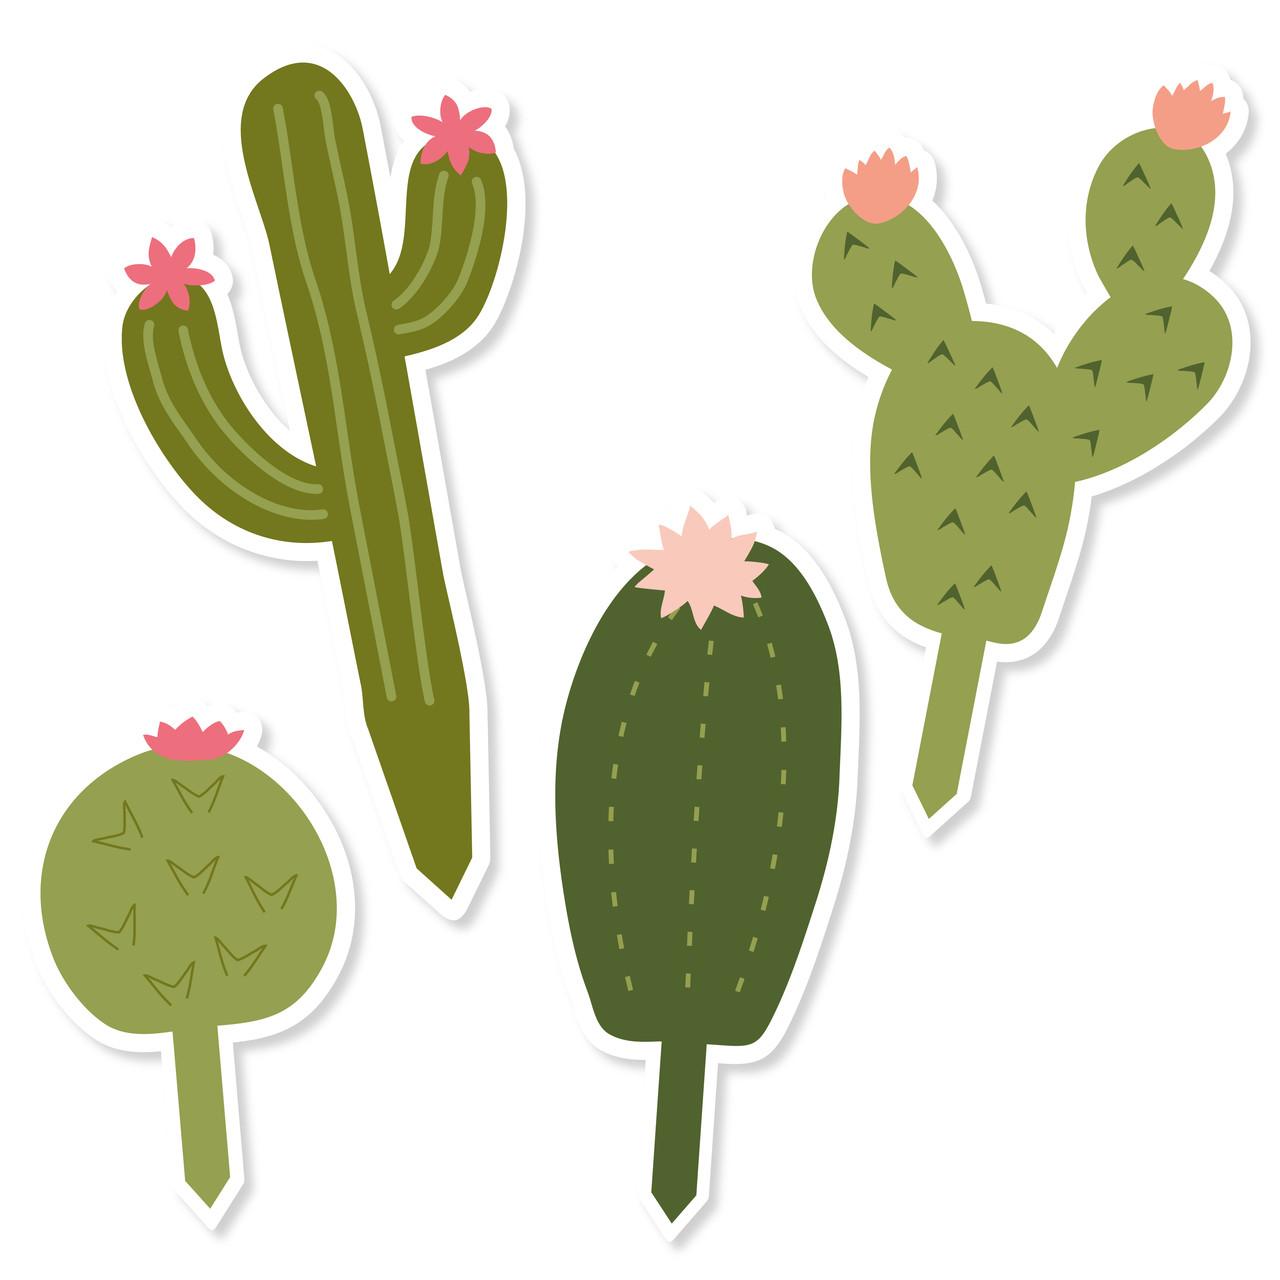 image regarding Cactus Printable named Cactus Cupcake Toppers